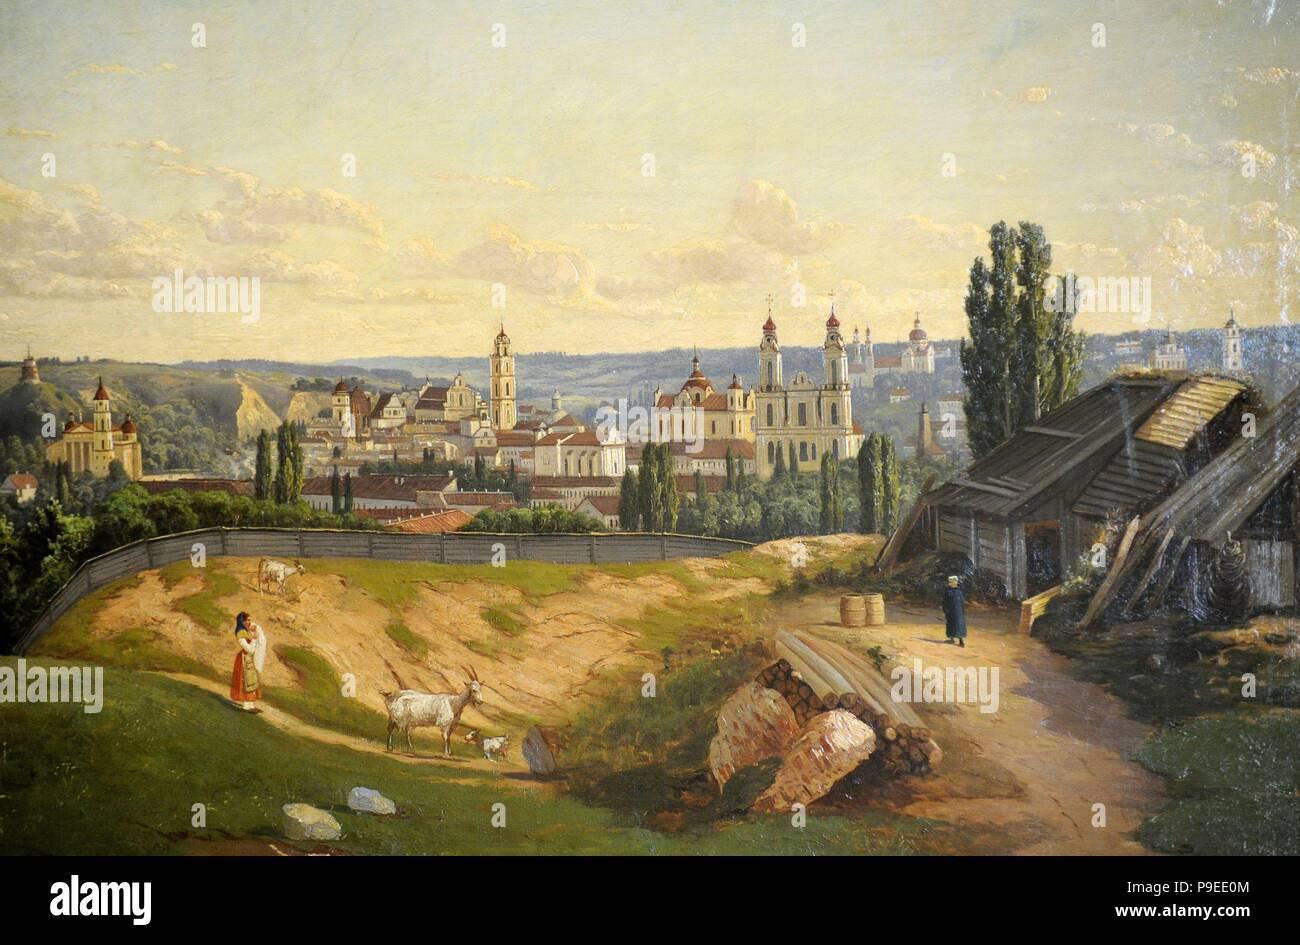 Josef Marszewski (1825-1883). Vilnius Viewed from Tauras Hill, 1872. Vilnius Picture Gallery. Lithuania. Stock Photo